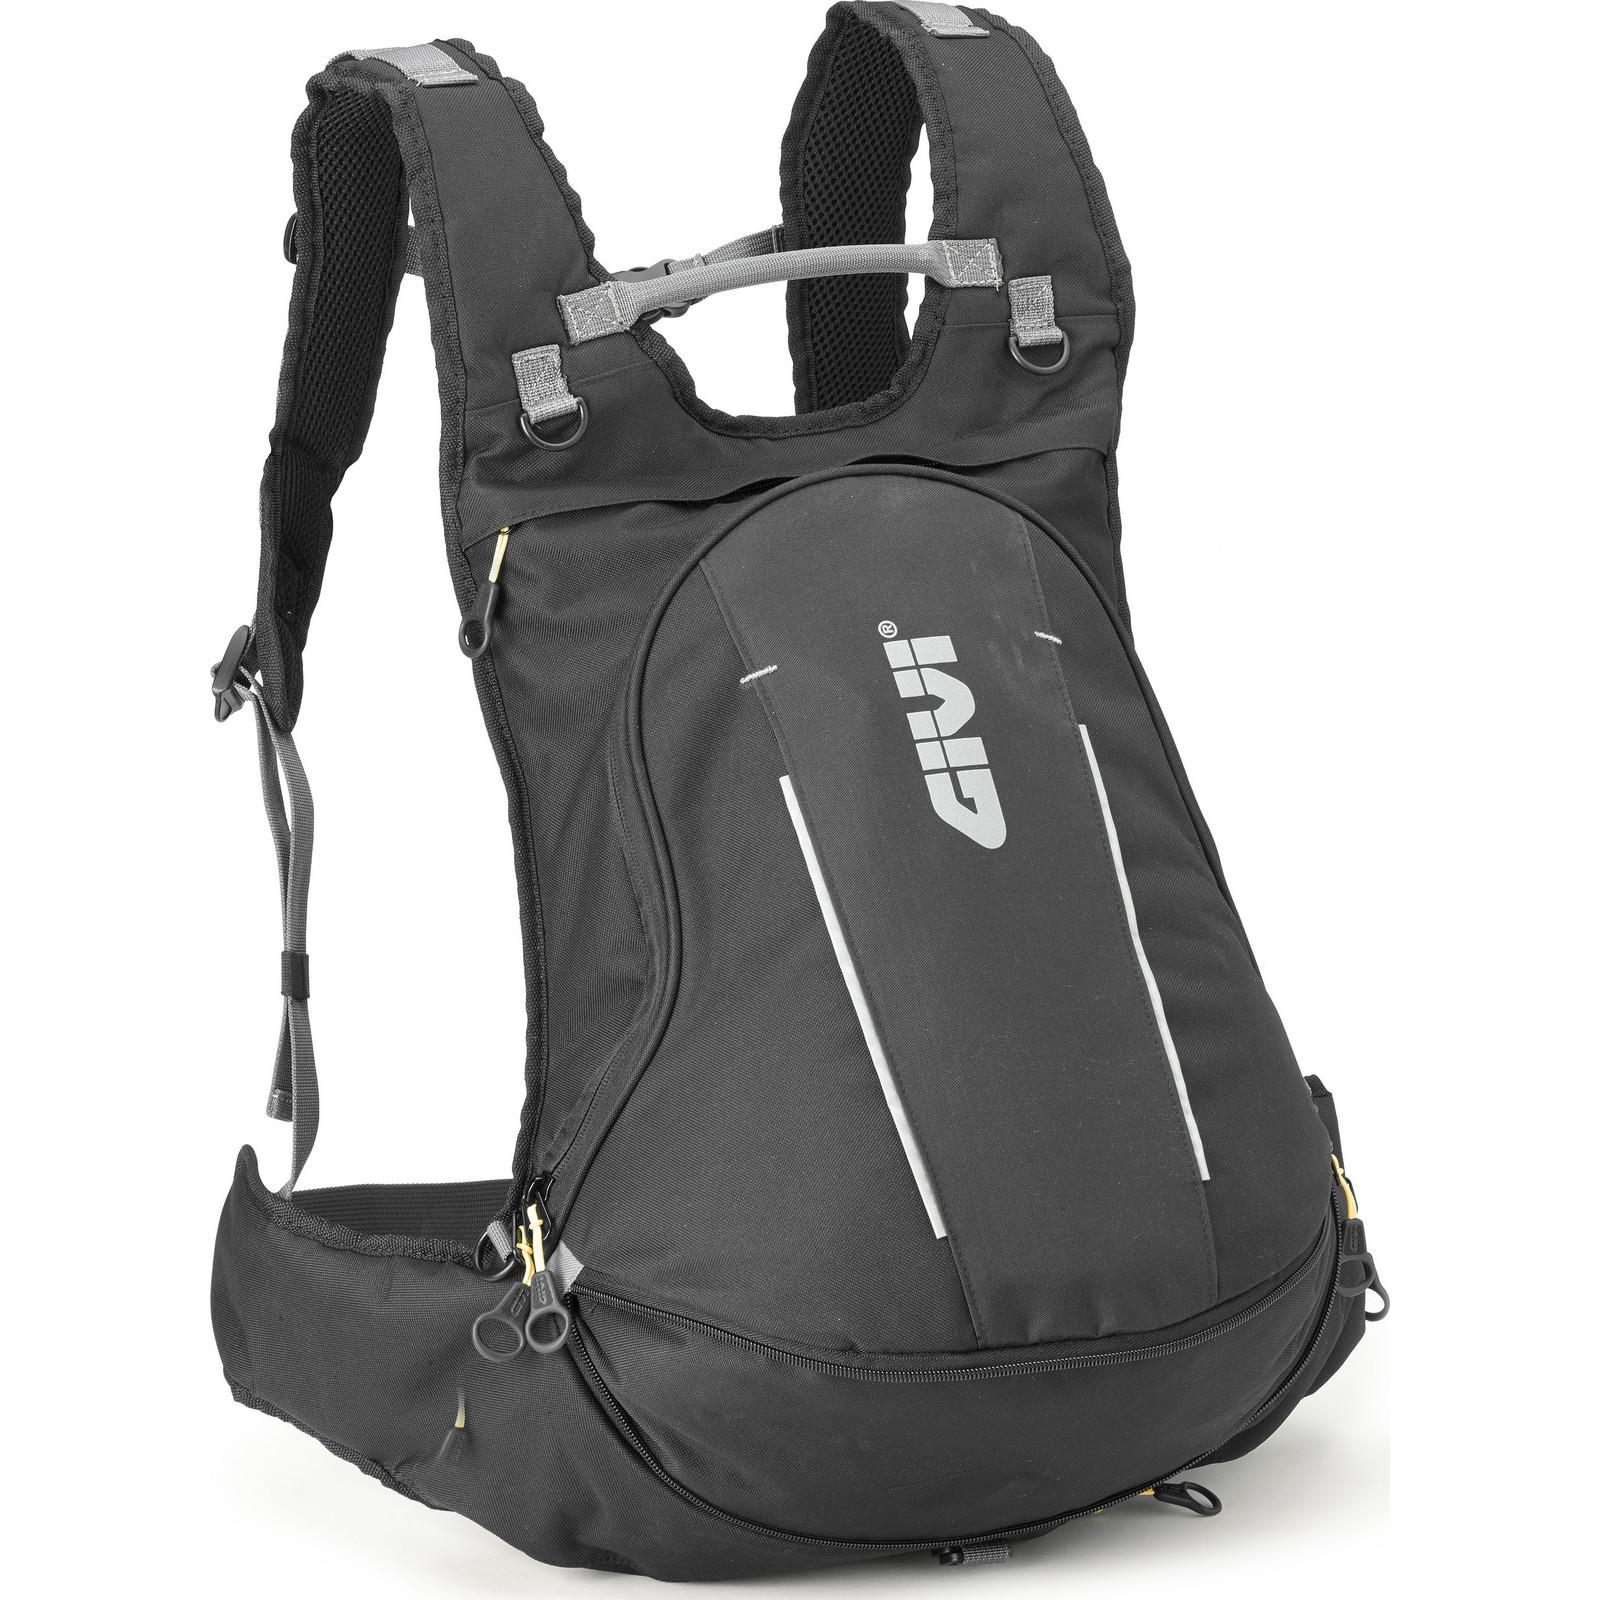 Sentinel Ea104b Givi Easy T Range Expandable Rucksack With Helmet Bag 22l Black